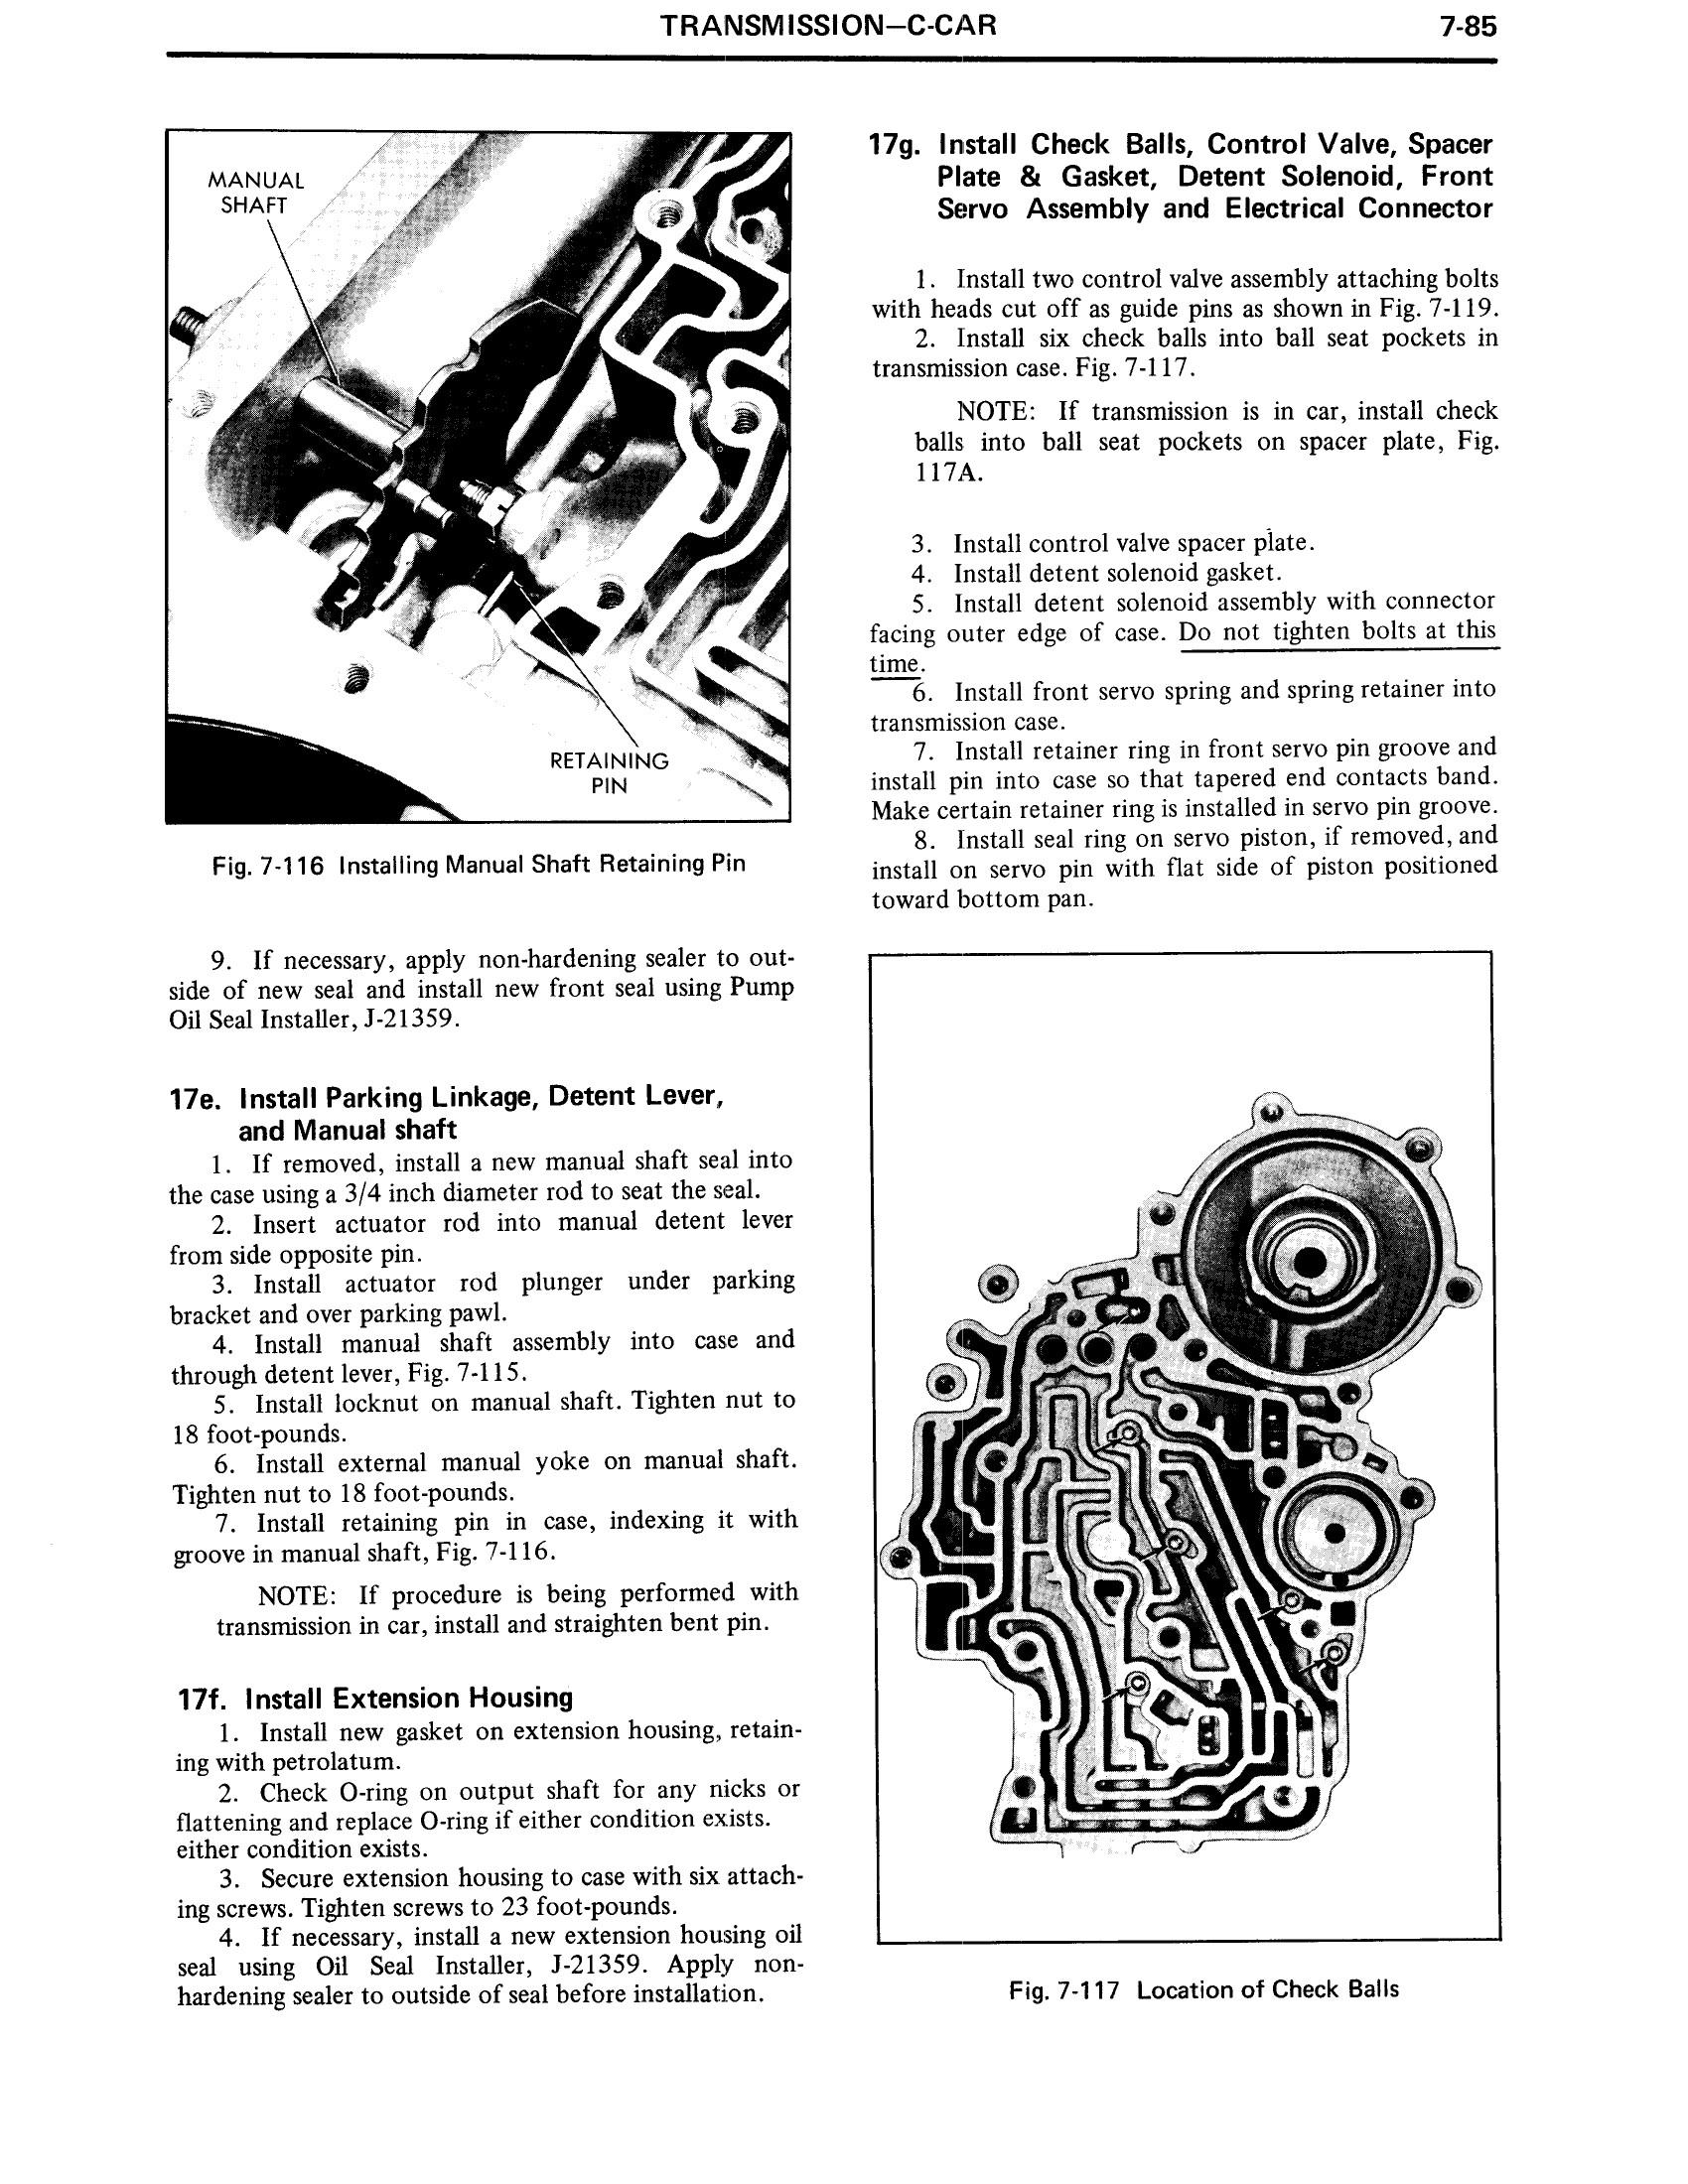 1971 Cadillac Shop Manual- Transmission Page 85 of 156